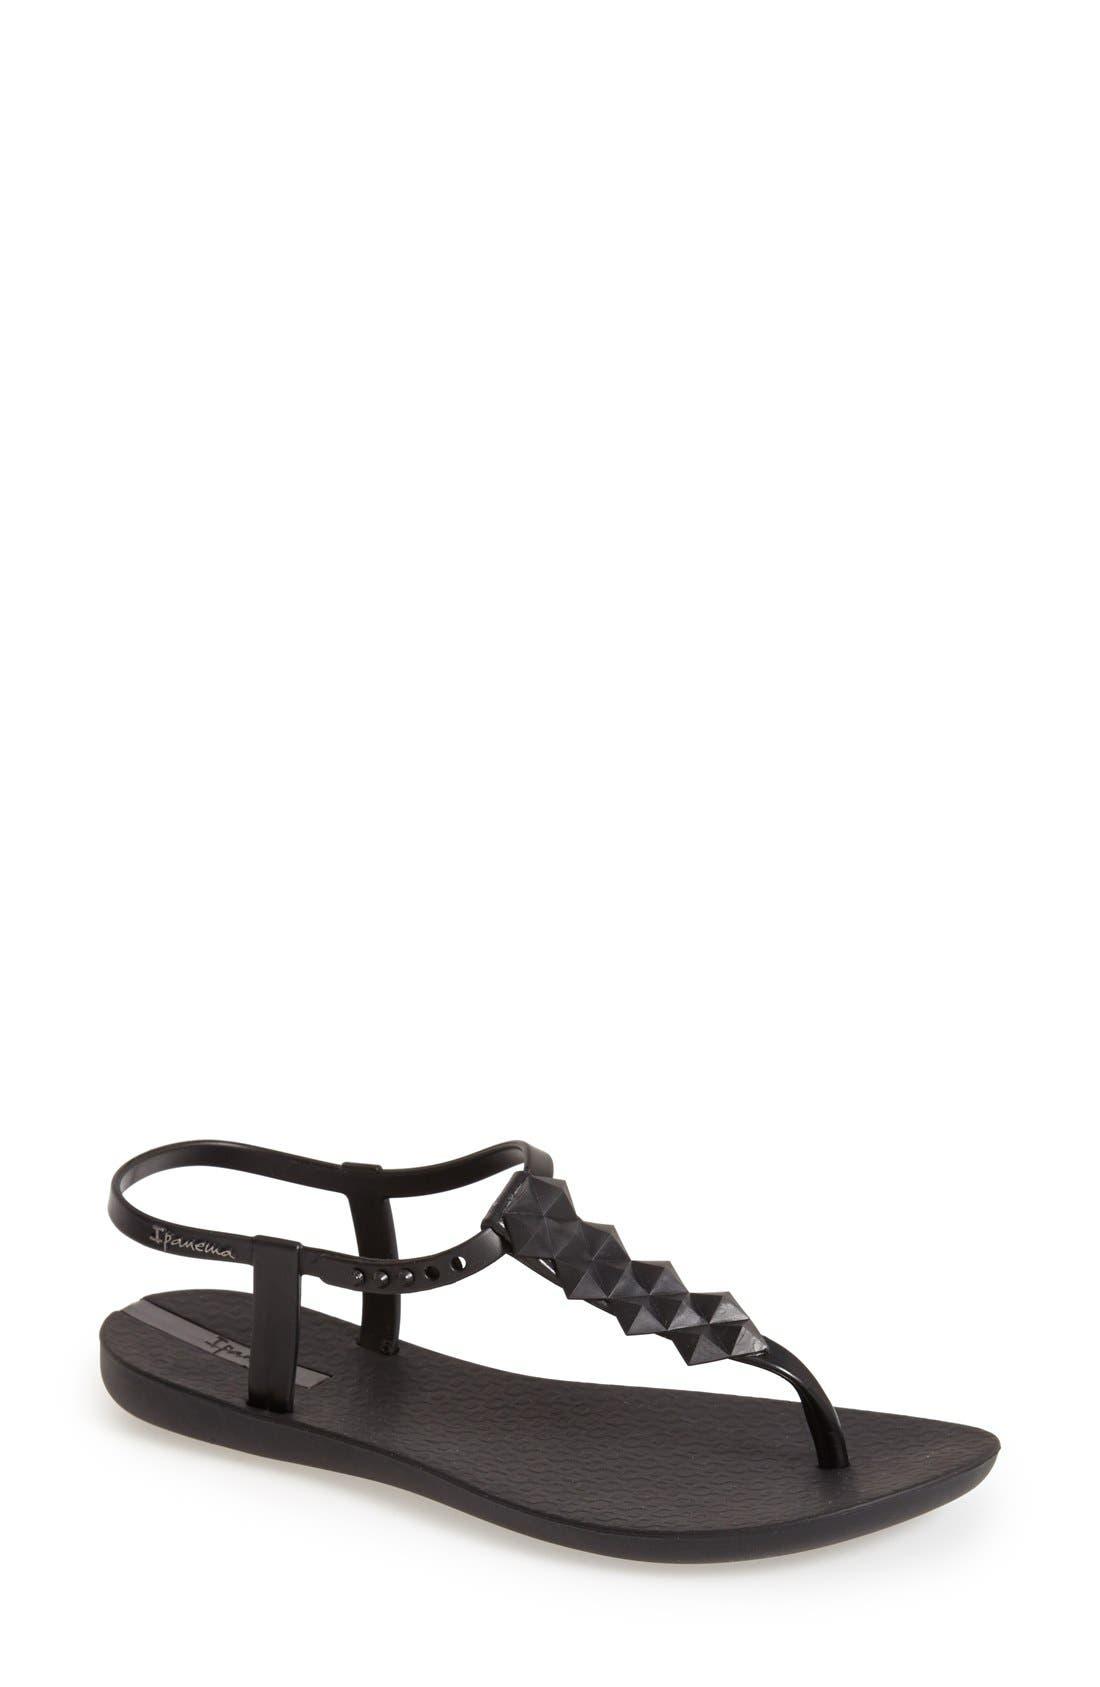 'Cleo' Pyramid Stud Ankle Strap Flip Flop,                             Main thumbnail 1, color,                             Black